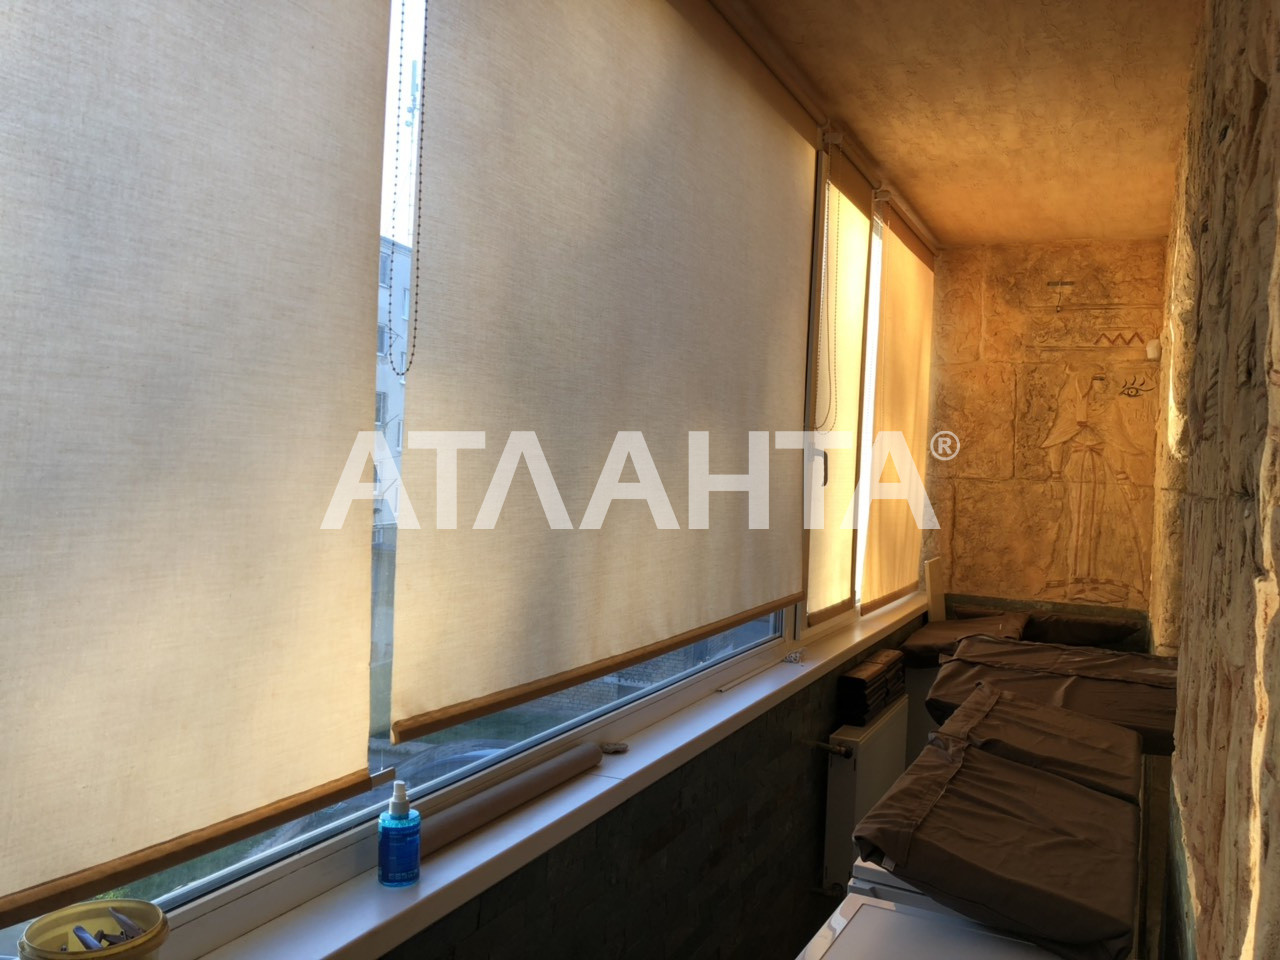 Продается 3-комнатная Квартира на ул. 1 Мая — 135 000 у.е. (фото №11)